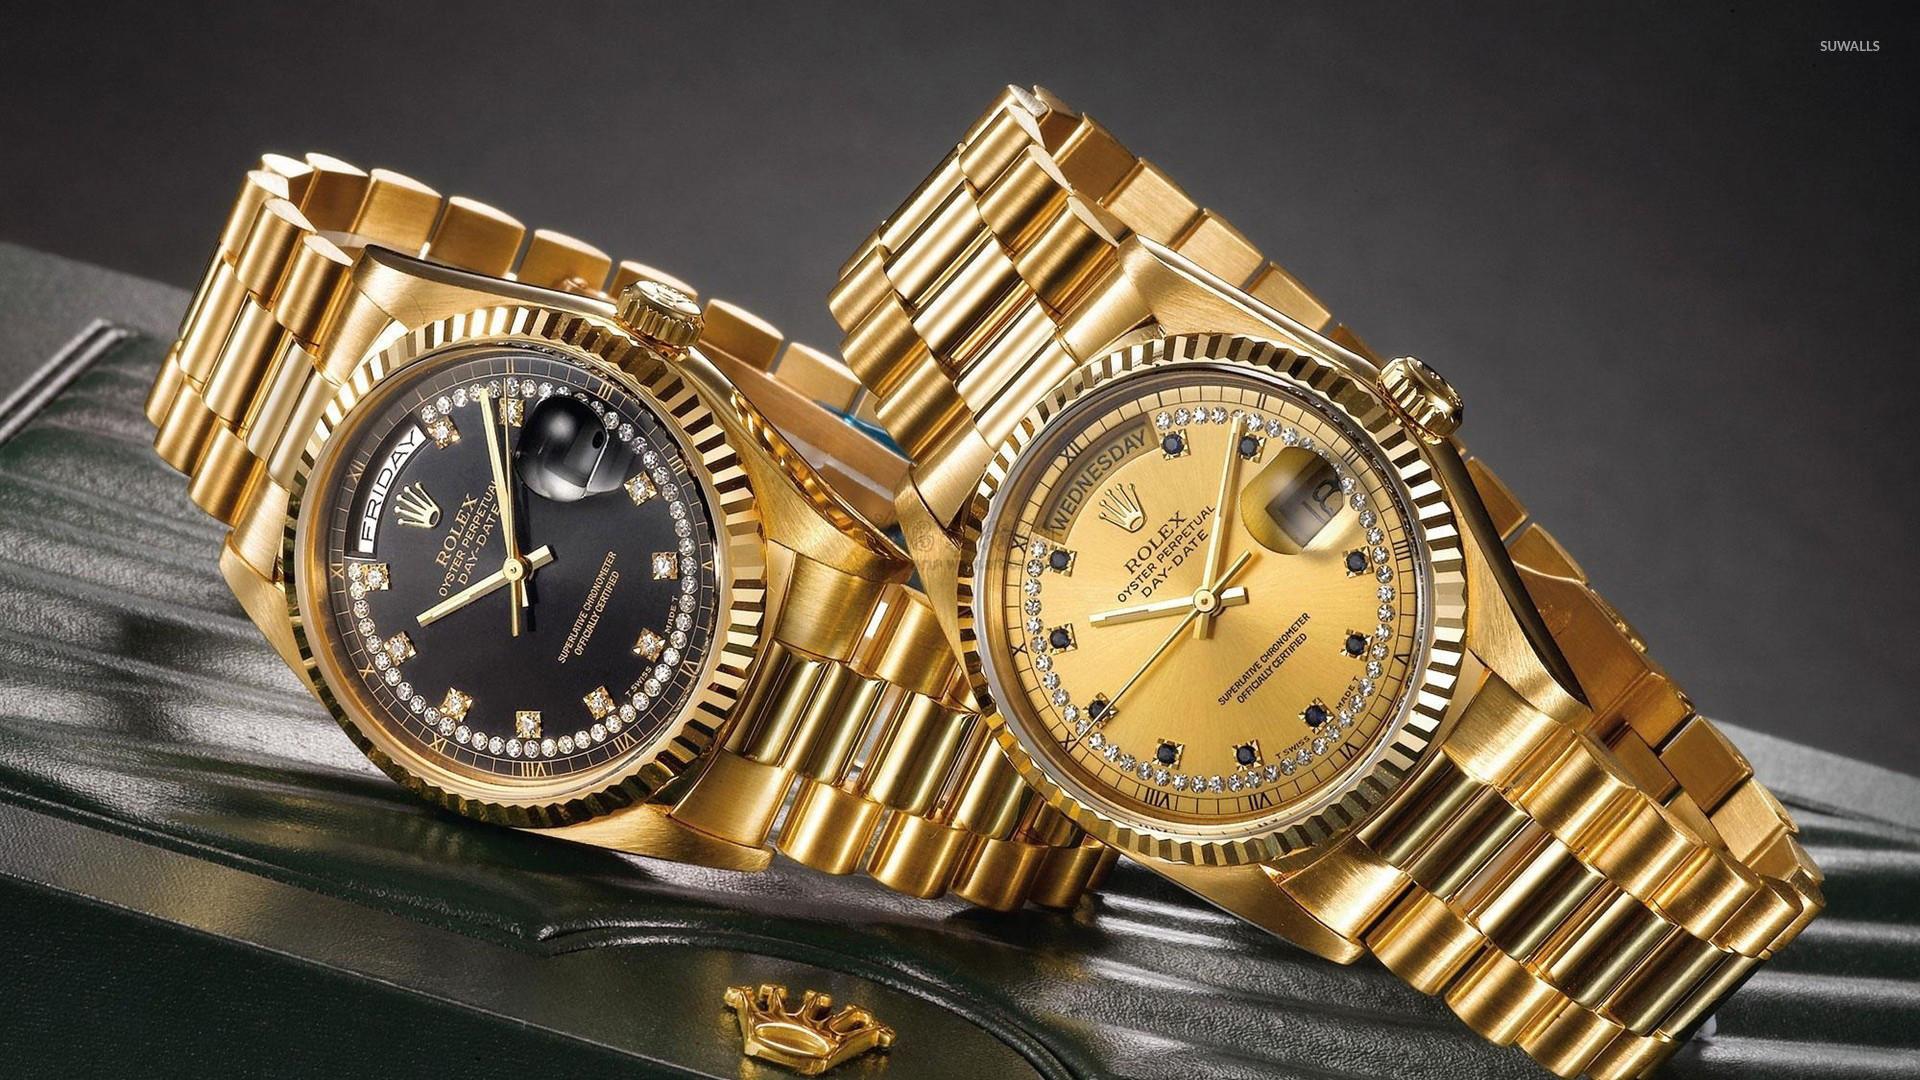 Res: 1920x1080, Rolex watches wallpaper